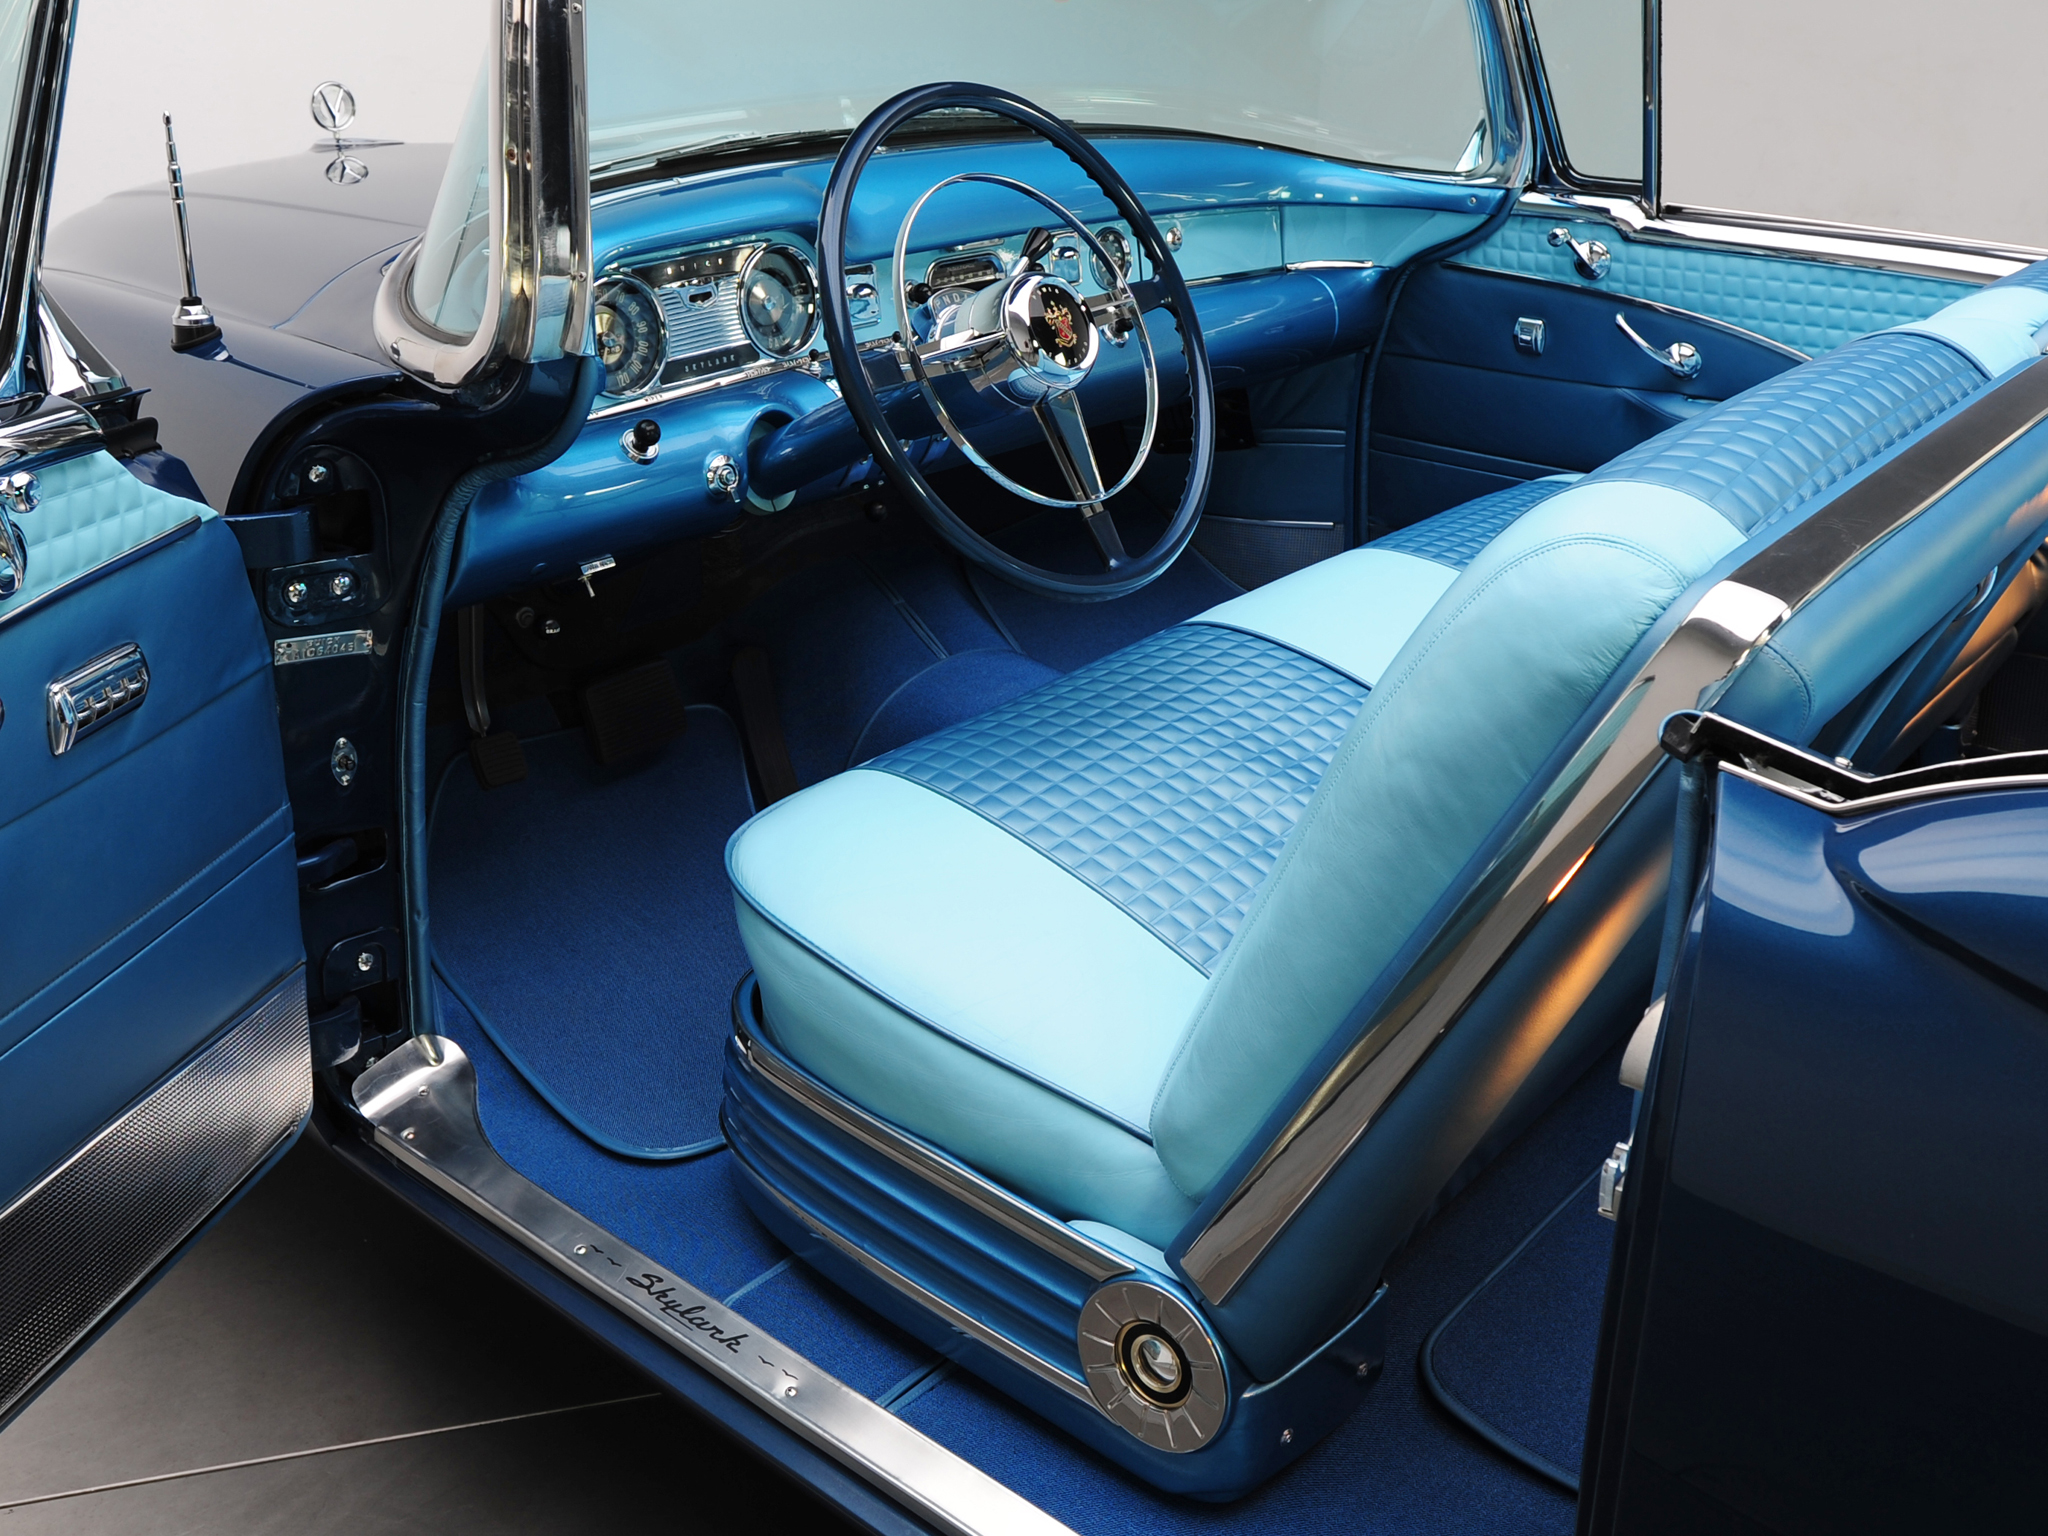 72 Buick Skylark Convertible1972 Gs Specs Performance 1954 Riviera Convertible 4667sx Retro Interior G